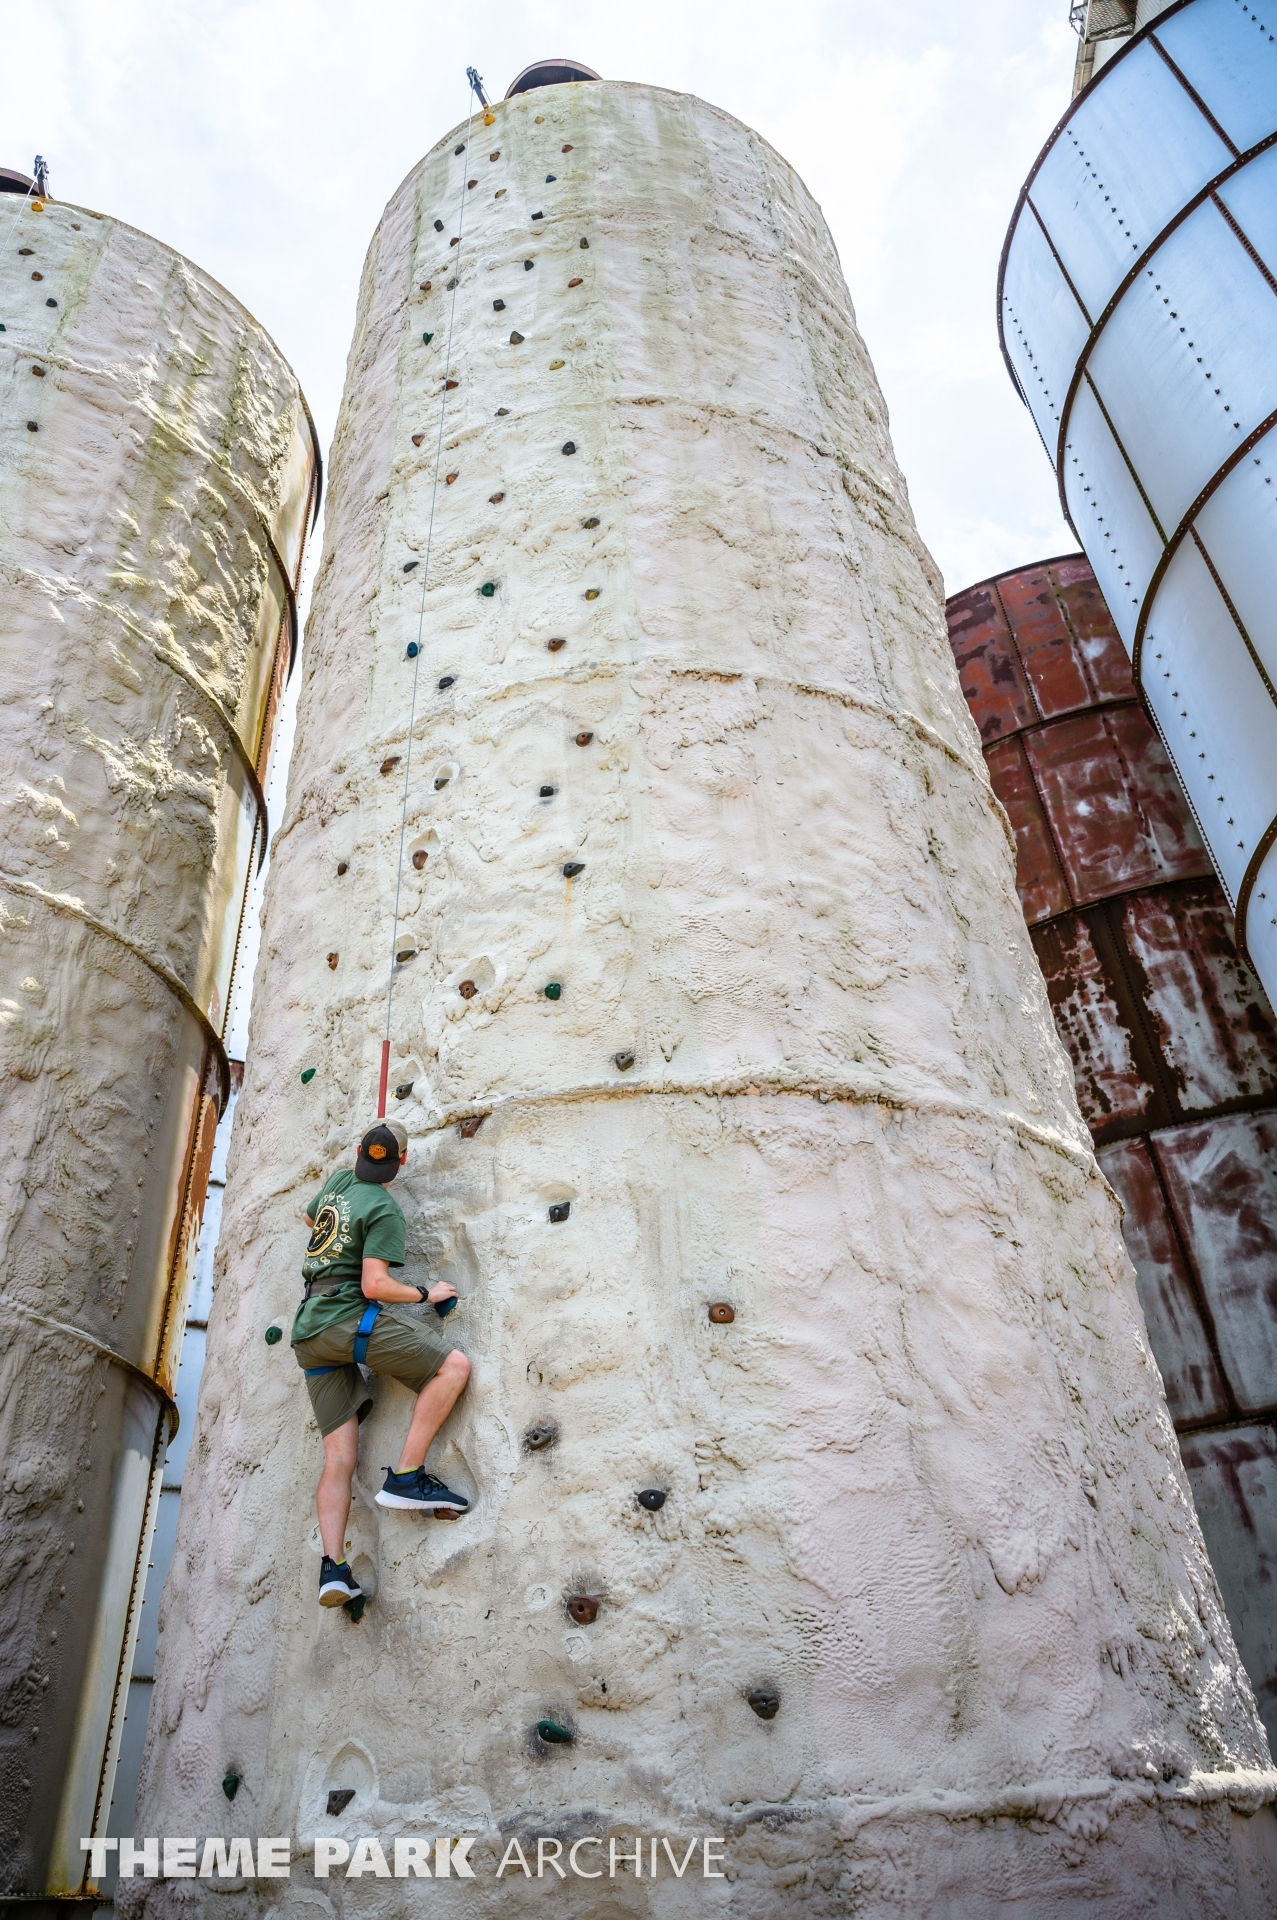 Silo Climb at ZDT's Amusement Park